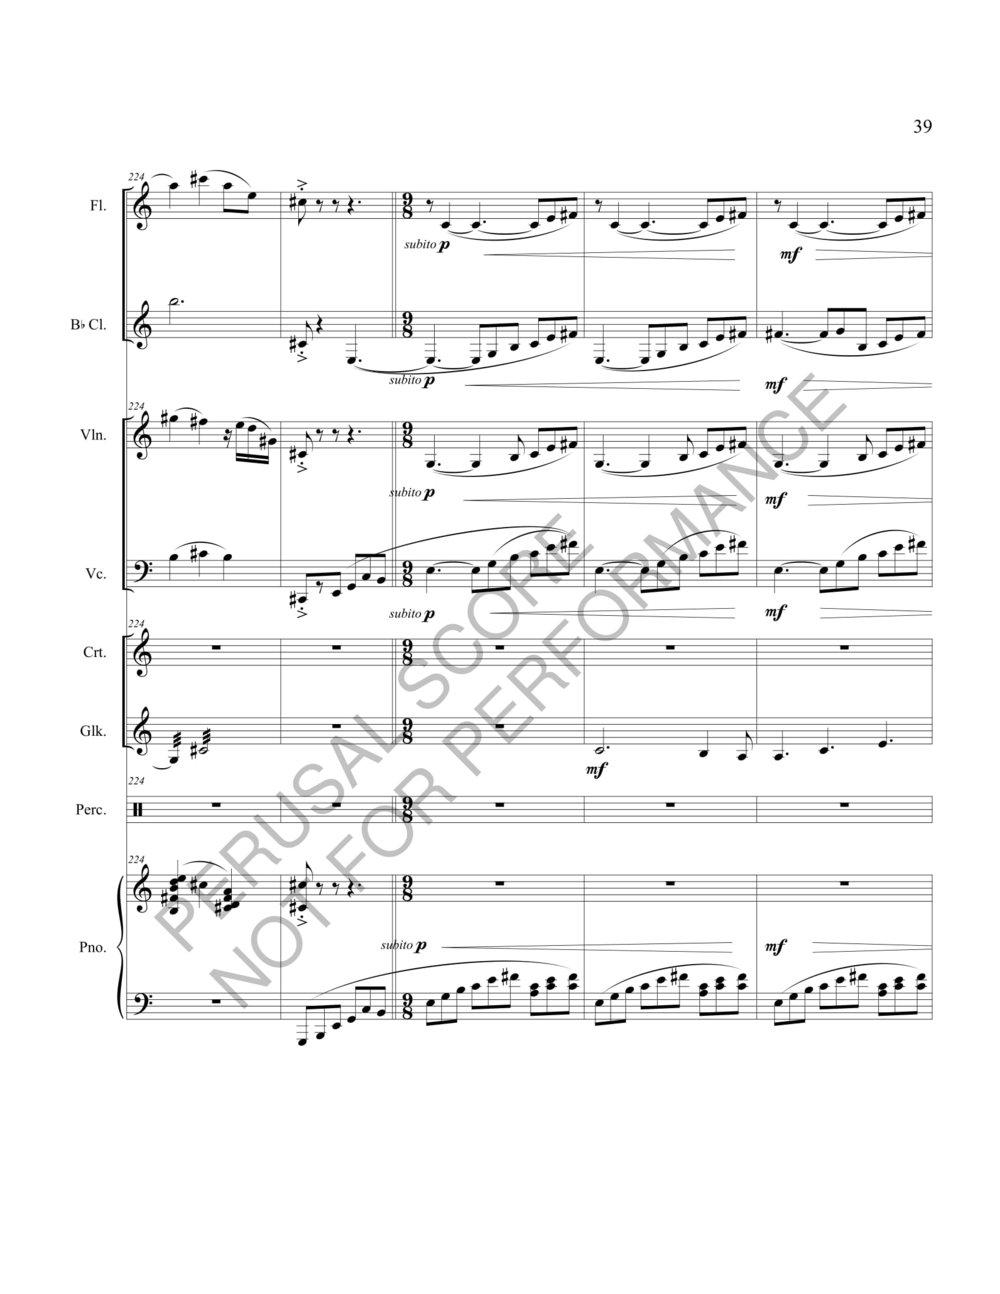 Boyd Terra Liberi Score-watermark-45.jpg